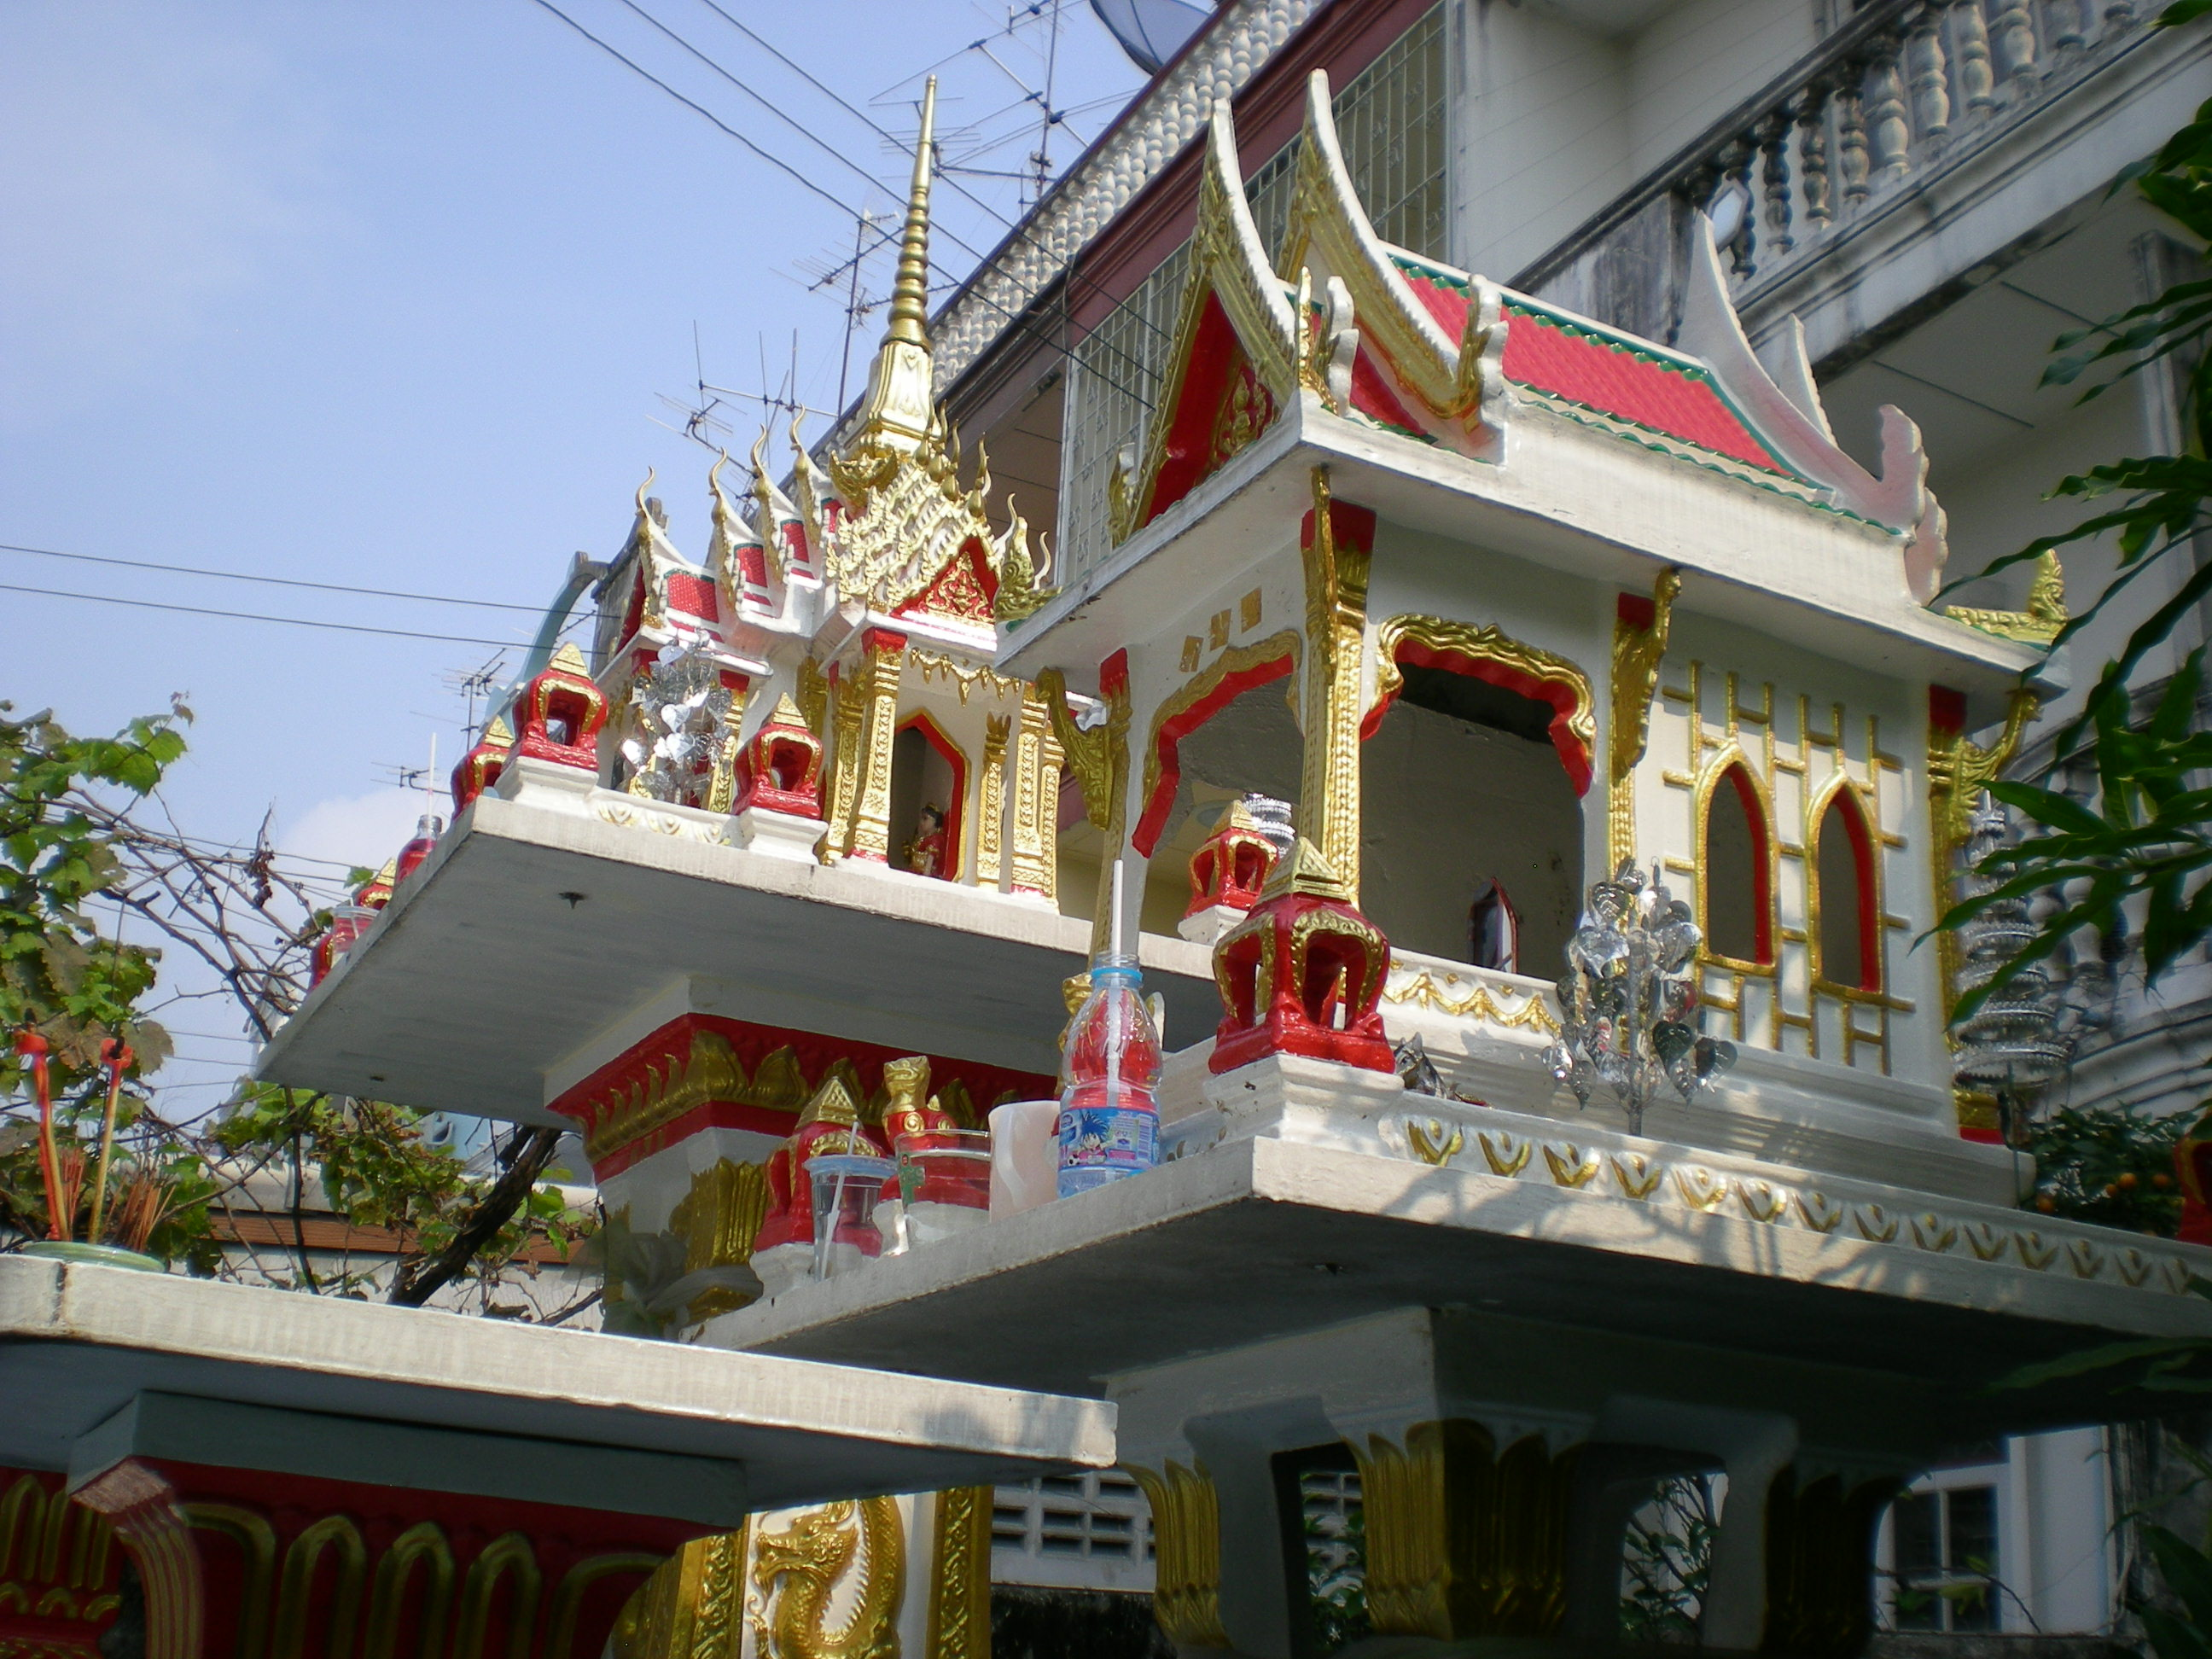 Pram and San Phra Pom - Spirit Houses in Thailand | Bangkok Beyond Blog